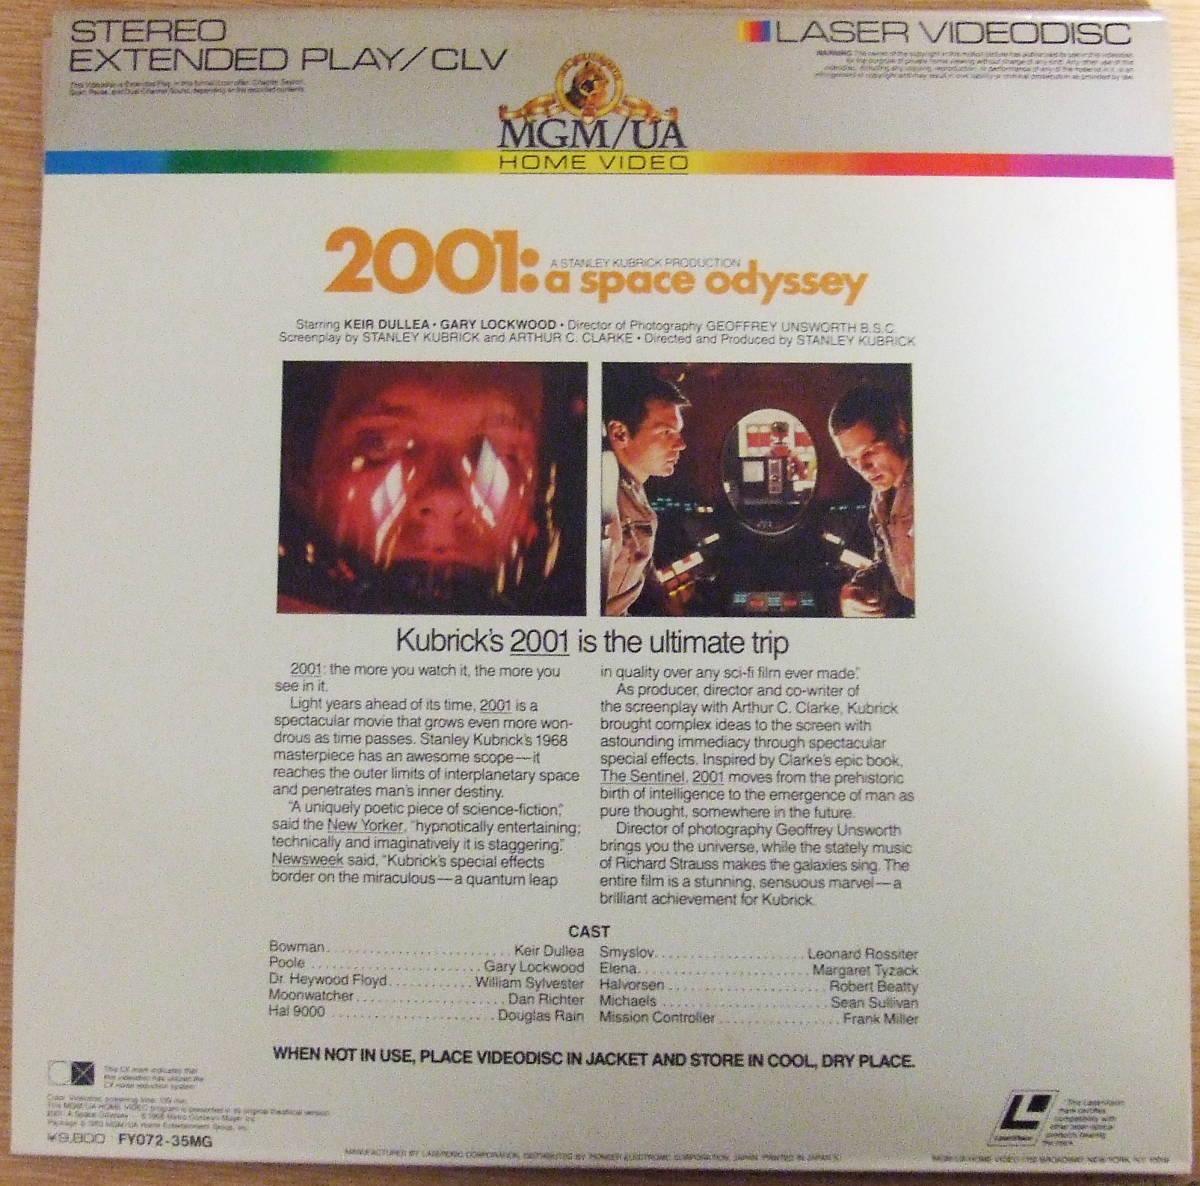 LD「2001:a space odyssey 2001年宇宙の旅 スタンリー・キューブリック」中古レーザーディスク_画像2